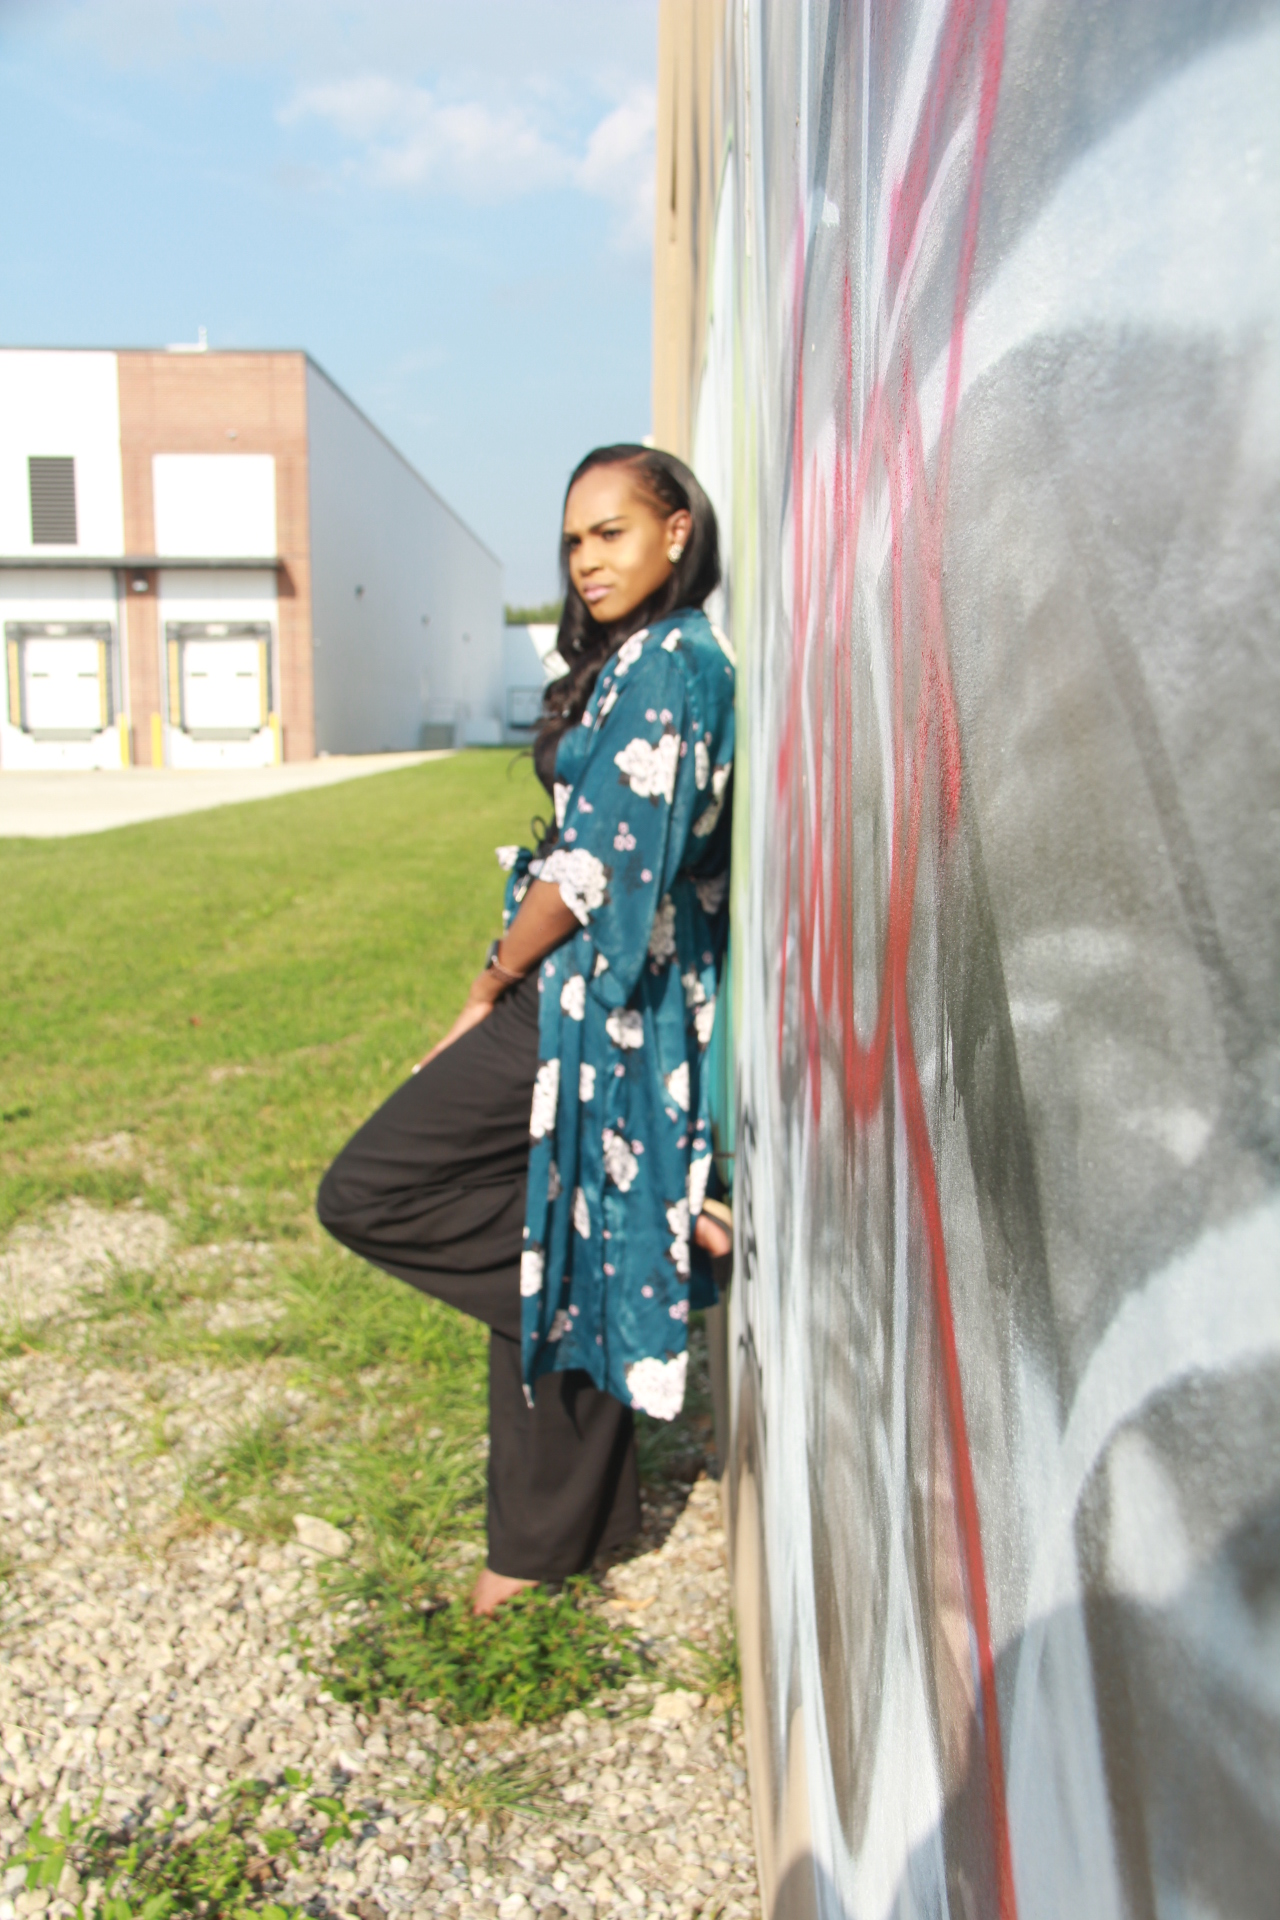 Style-files-Monteau-Green-floral-kimono-Boohoo-Wideleg-pants-zara-pvc-clear-black-pumps-forever21-lace-corset-bodysuit-ooohlalablog-9